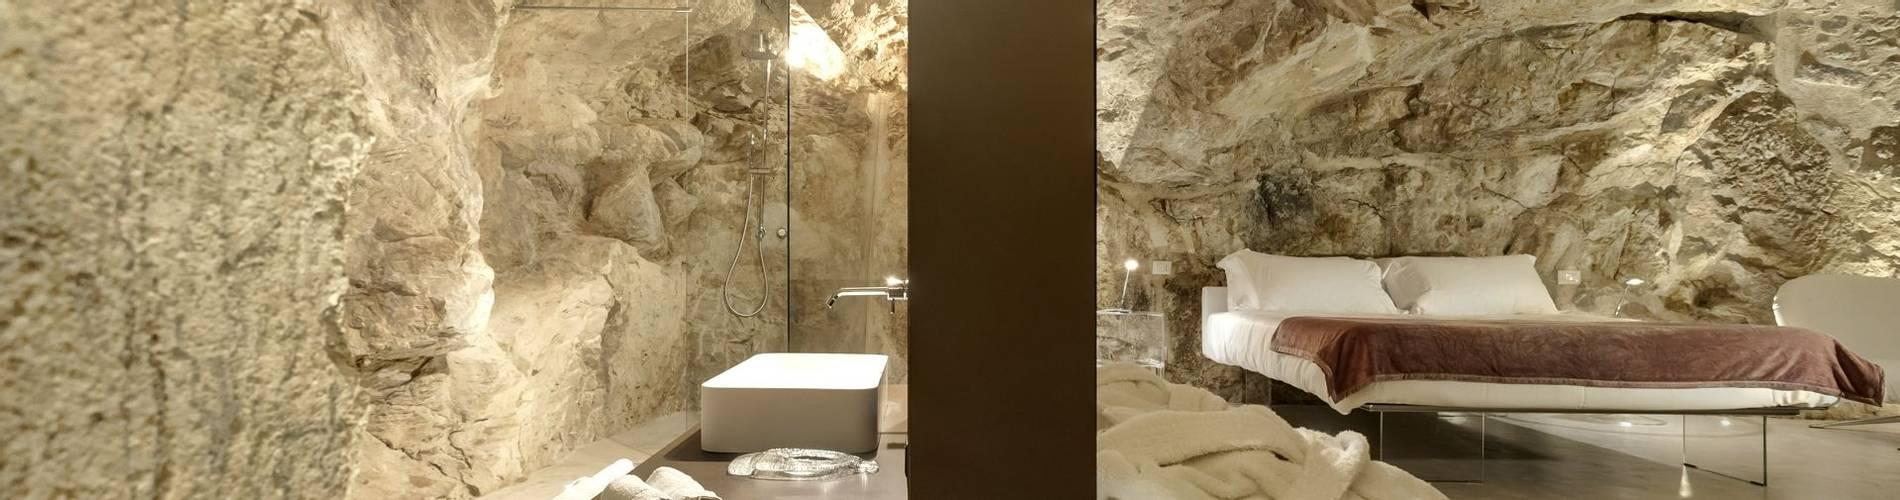 Locanda Don Serafino, Sicily, Italy, Luxury Suite (12).jpg